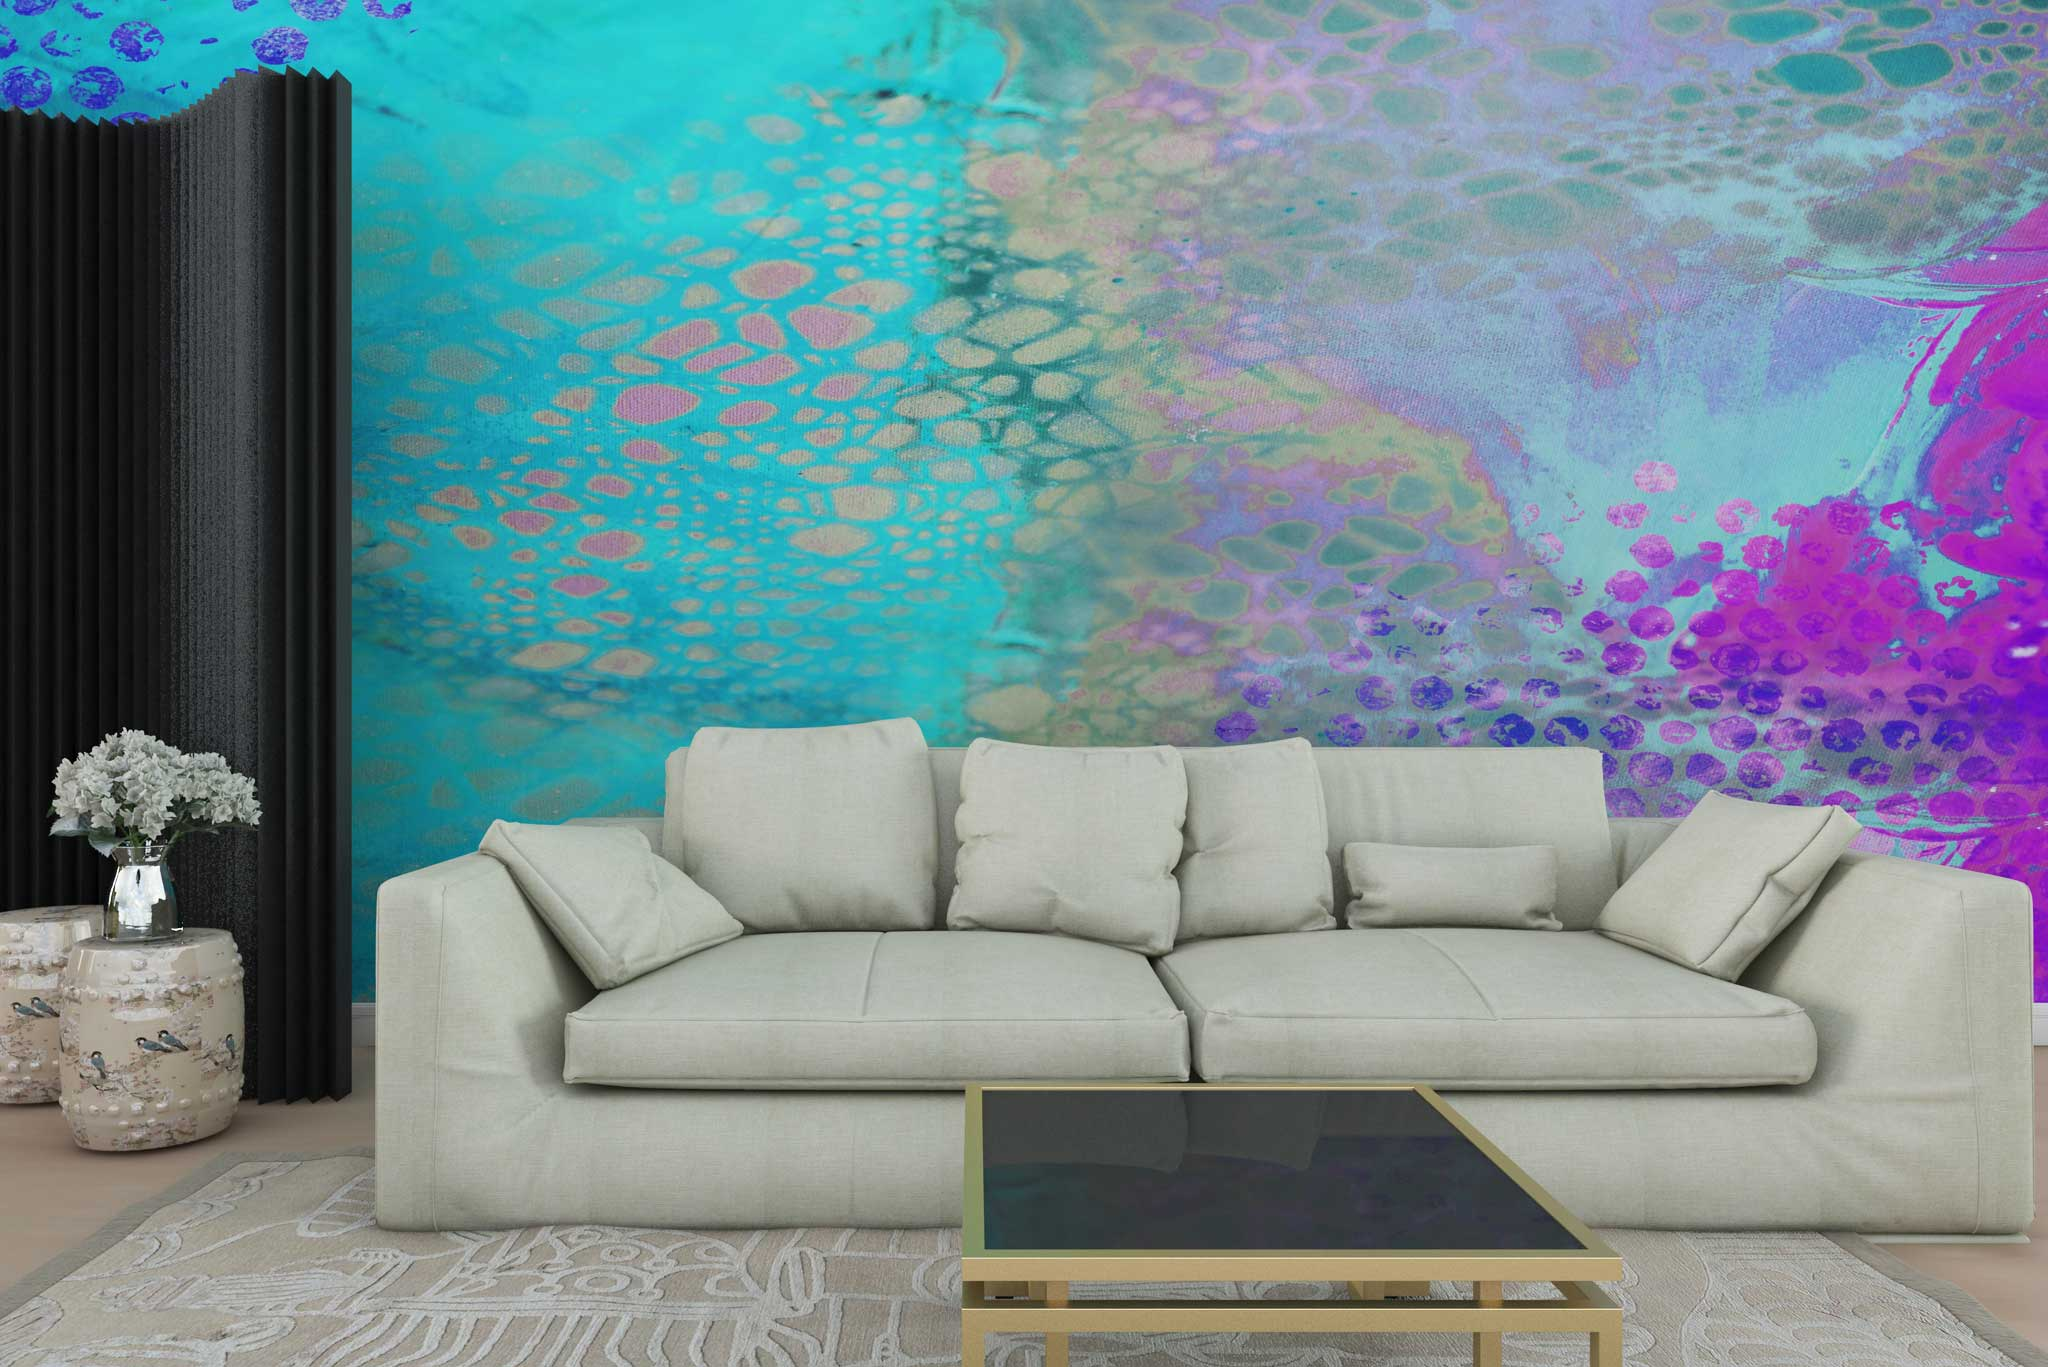 tapet-fototapet-personalizat-comanda-bucuresti-pictura-abstracta-turquoise-perete-lux-special